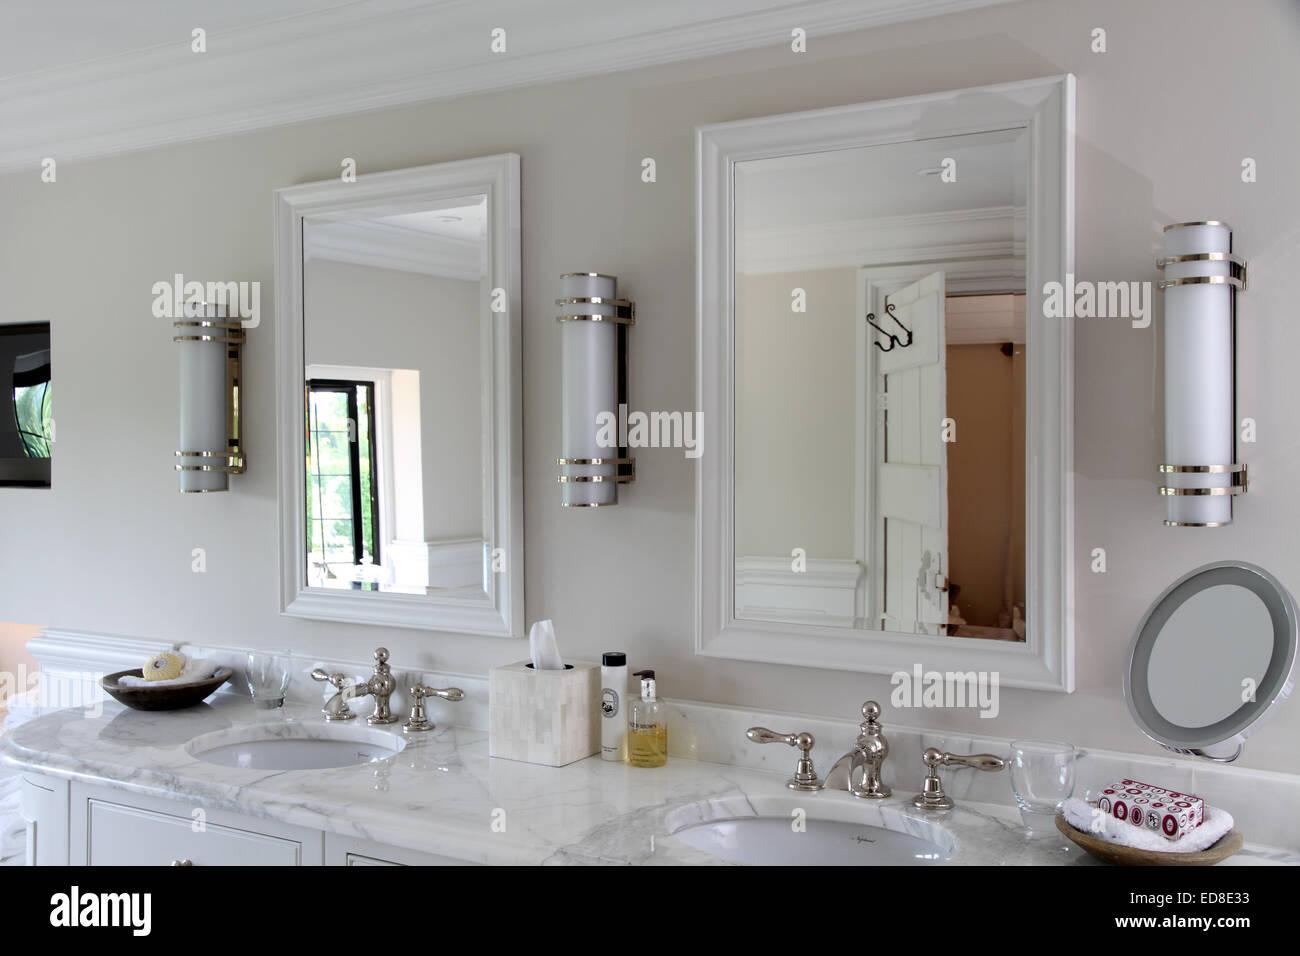 Faience Coloree Salle De Bain ~ Victorian Style Basin Bathroom Photos Victorian Style Basin